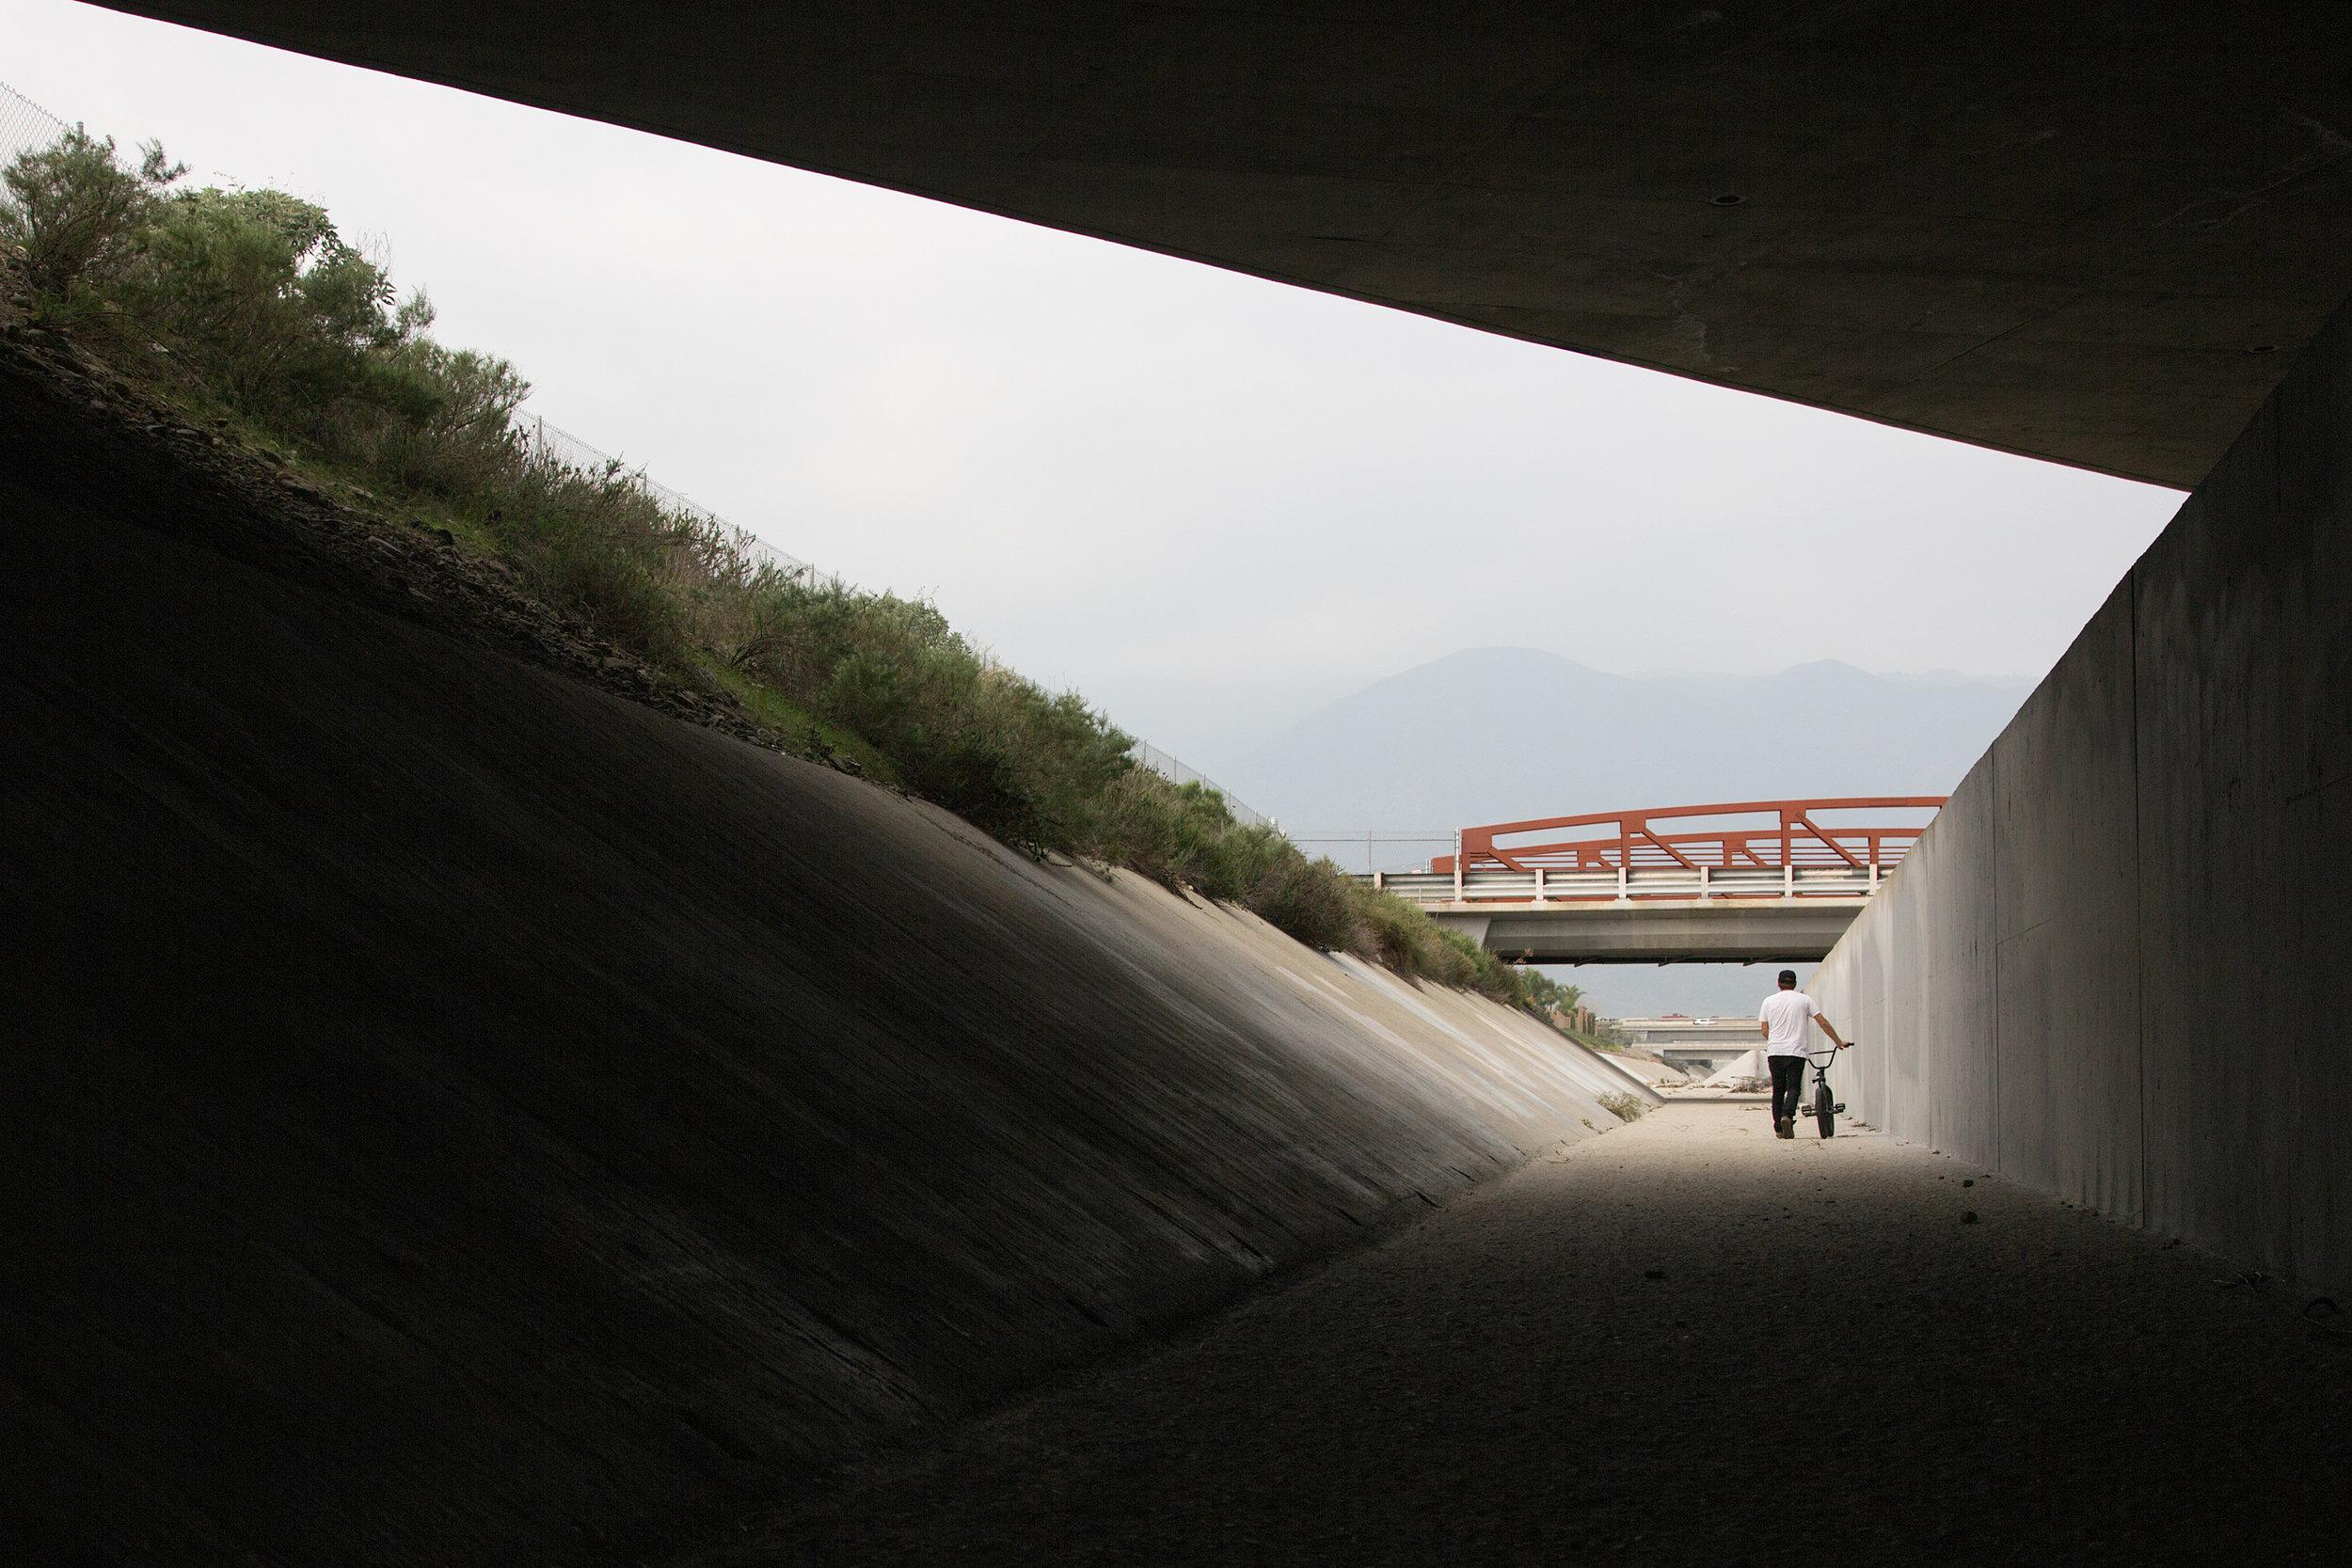 Jason-Enns-BMX-Walking.jpg